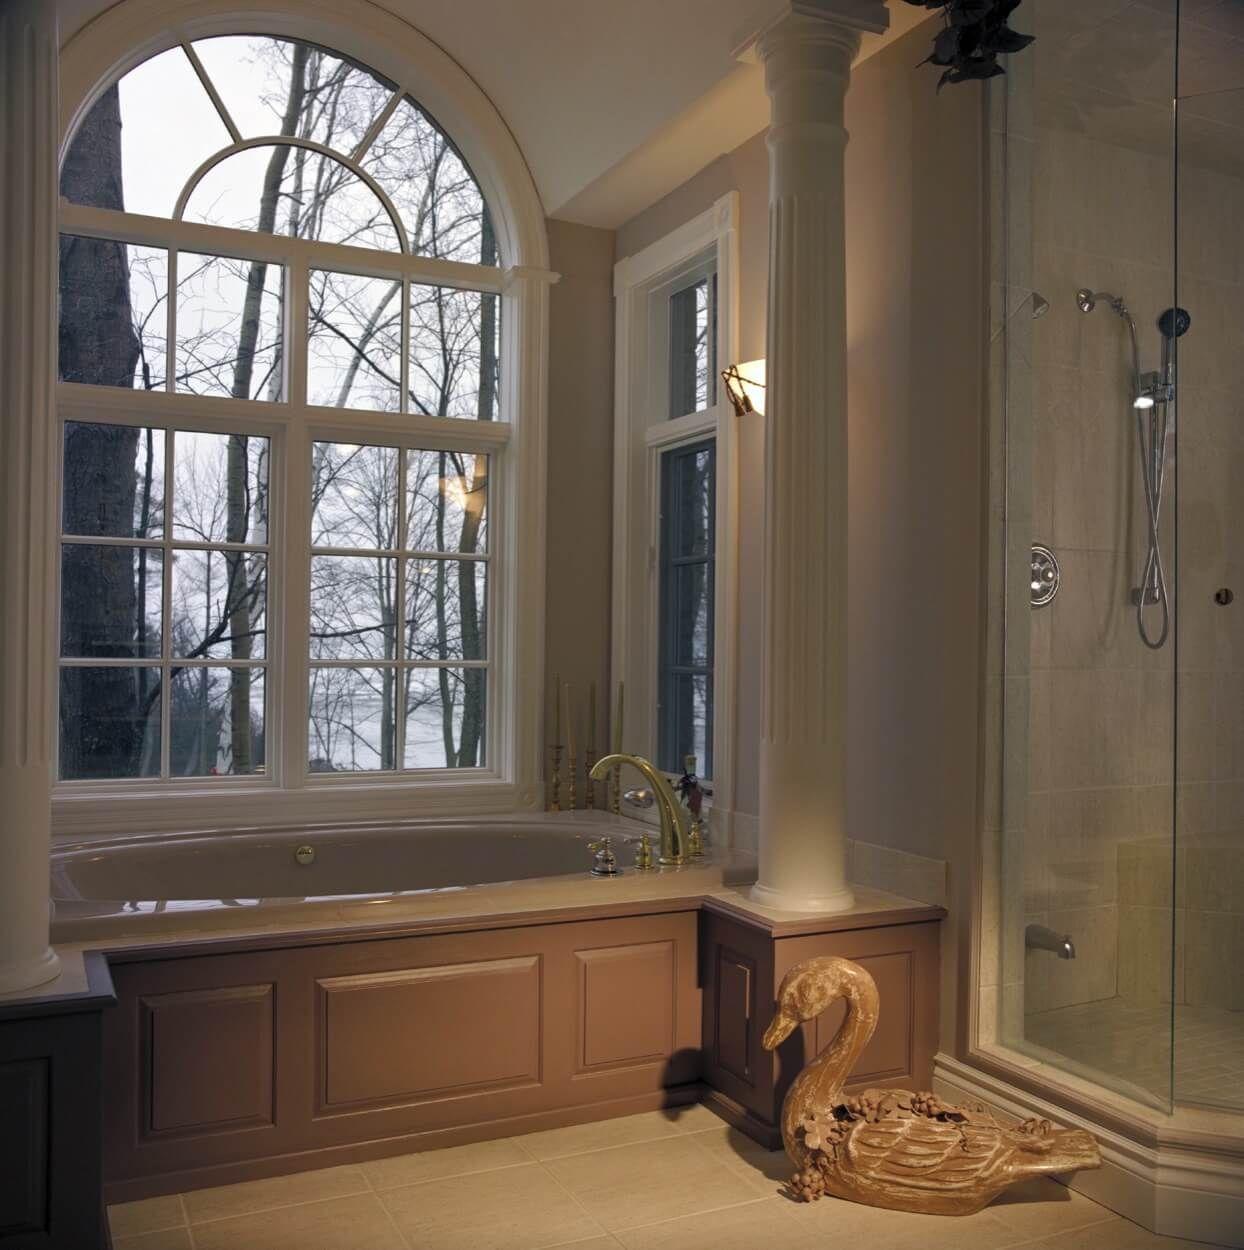 Built In Soaking Tub Under Oversized Window | Bathroom Ideas ...